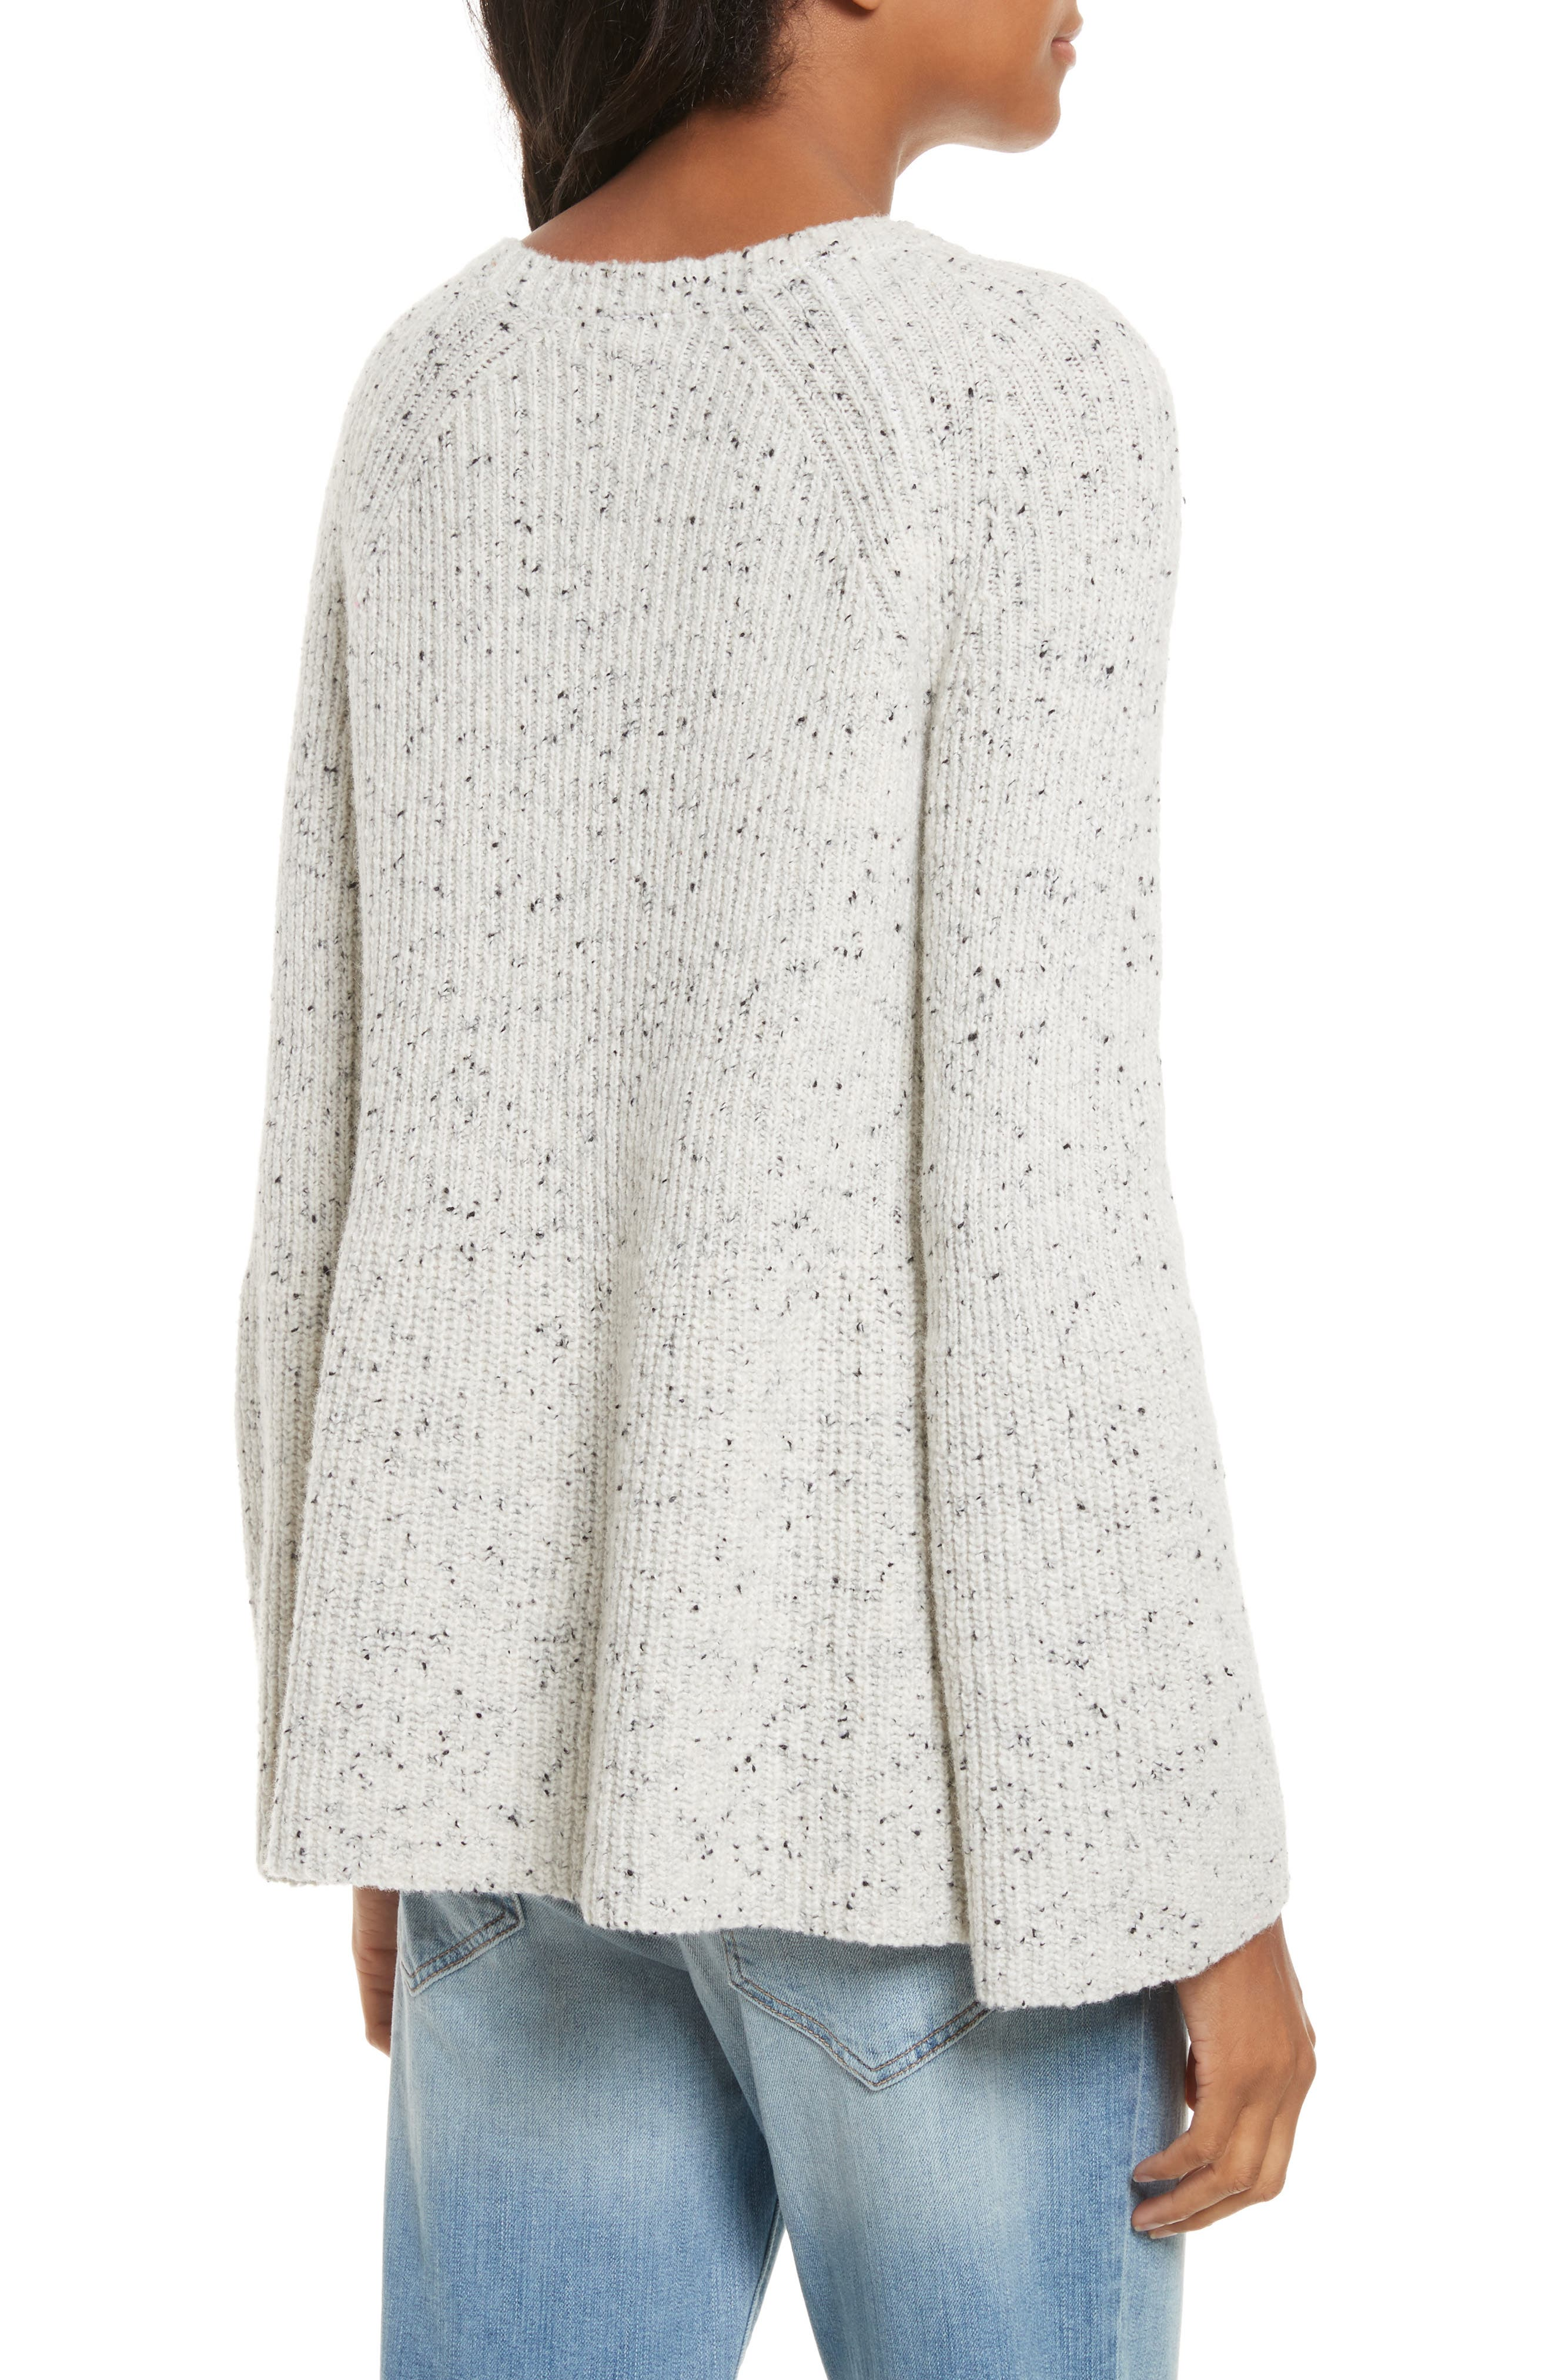 Paden Wool Blend Sweater,                             Alternate thumbnail 2, color,                             114